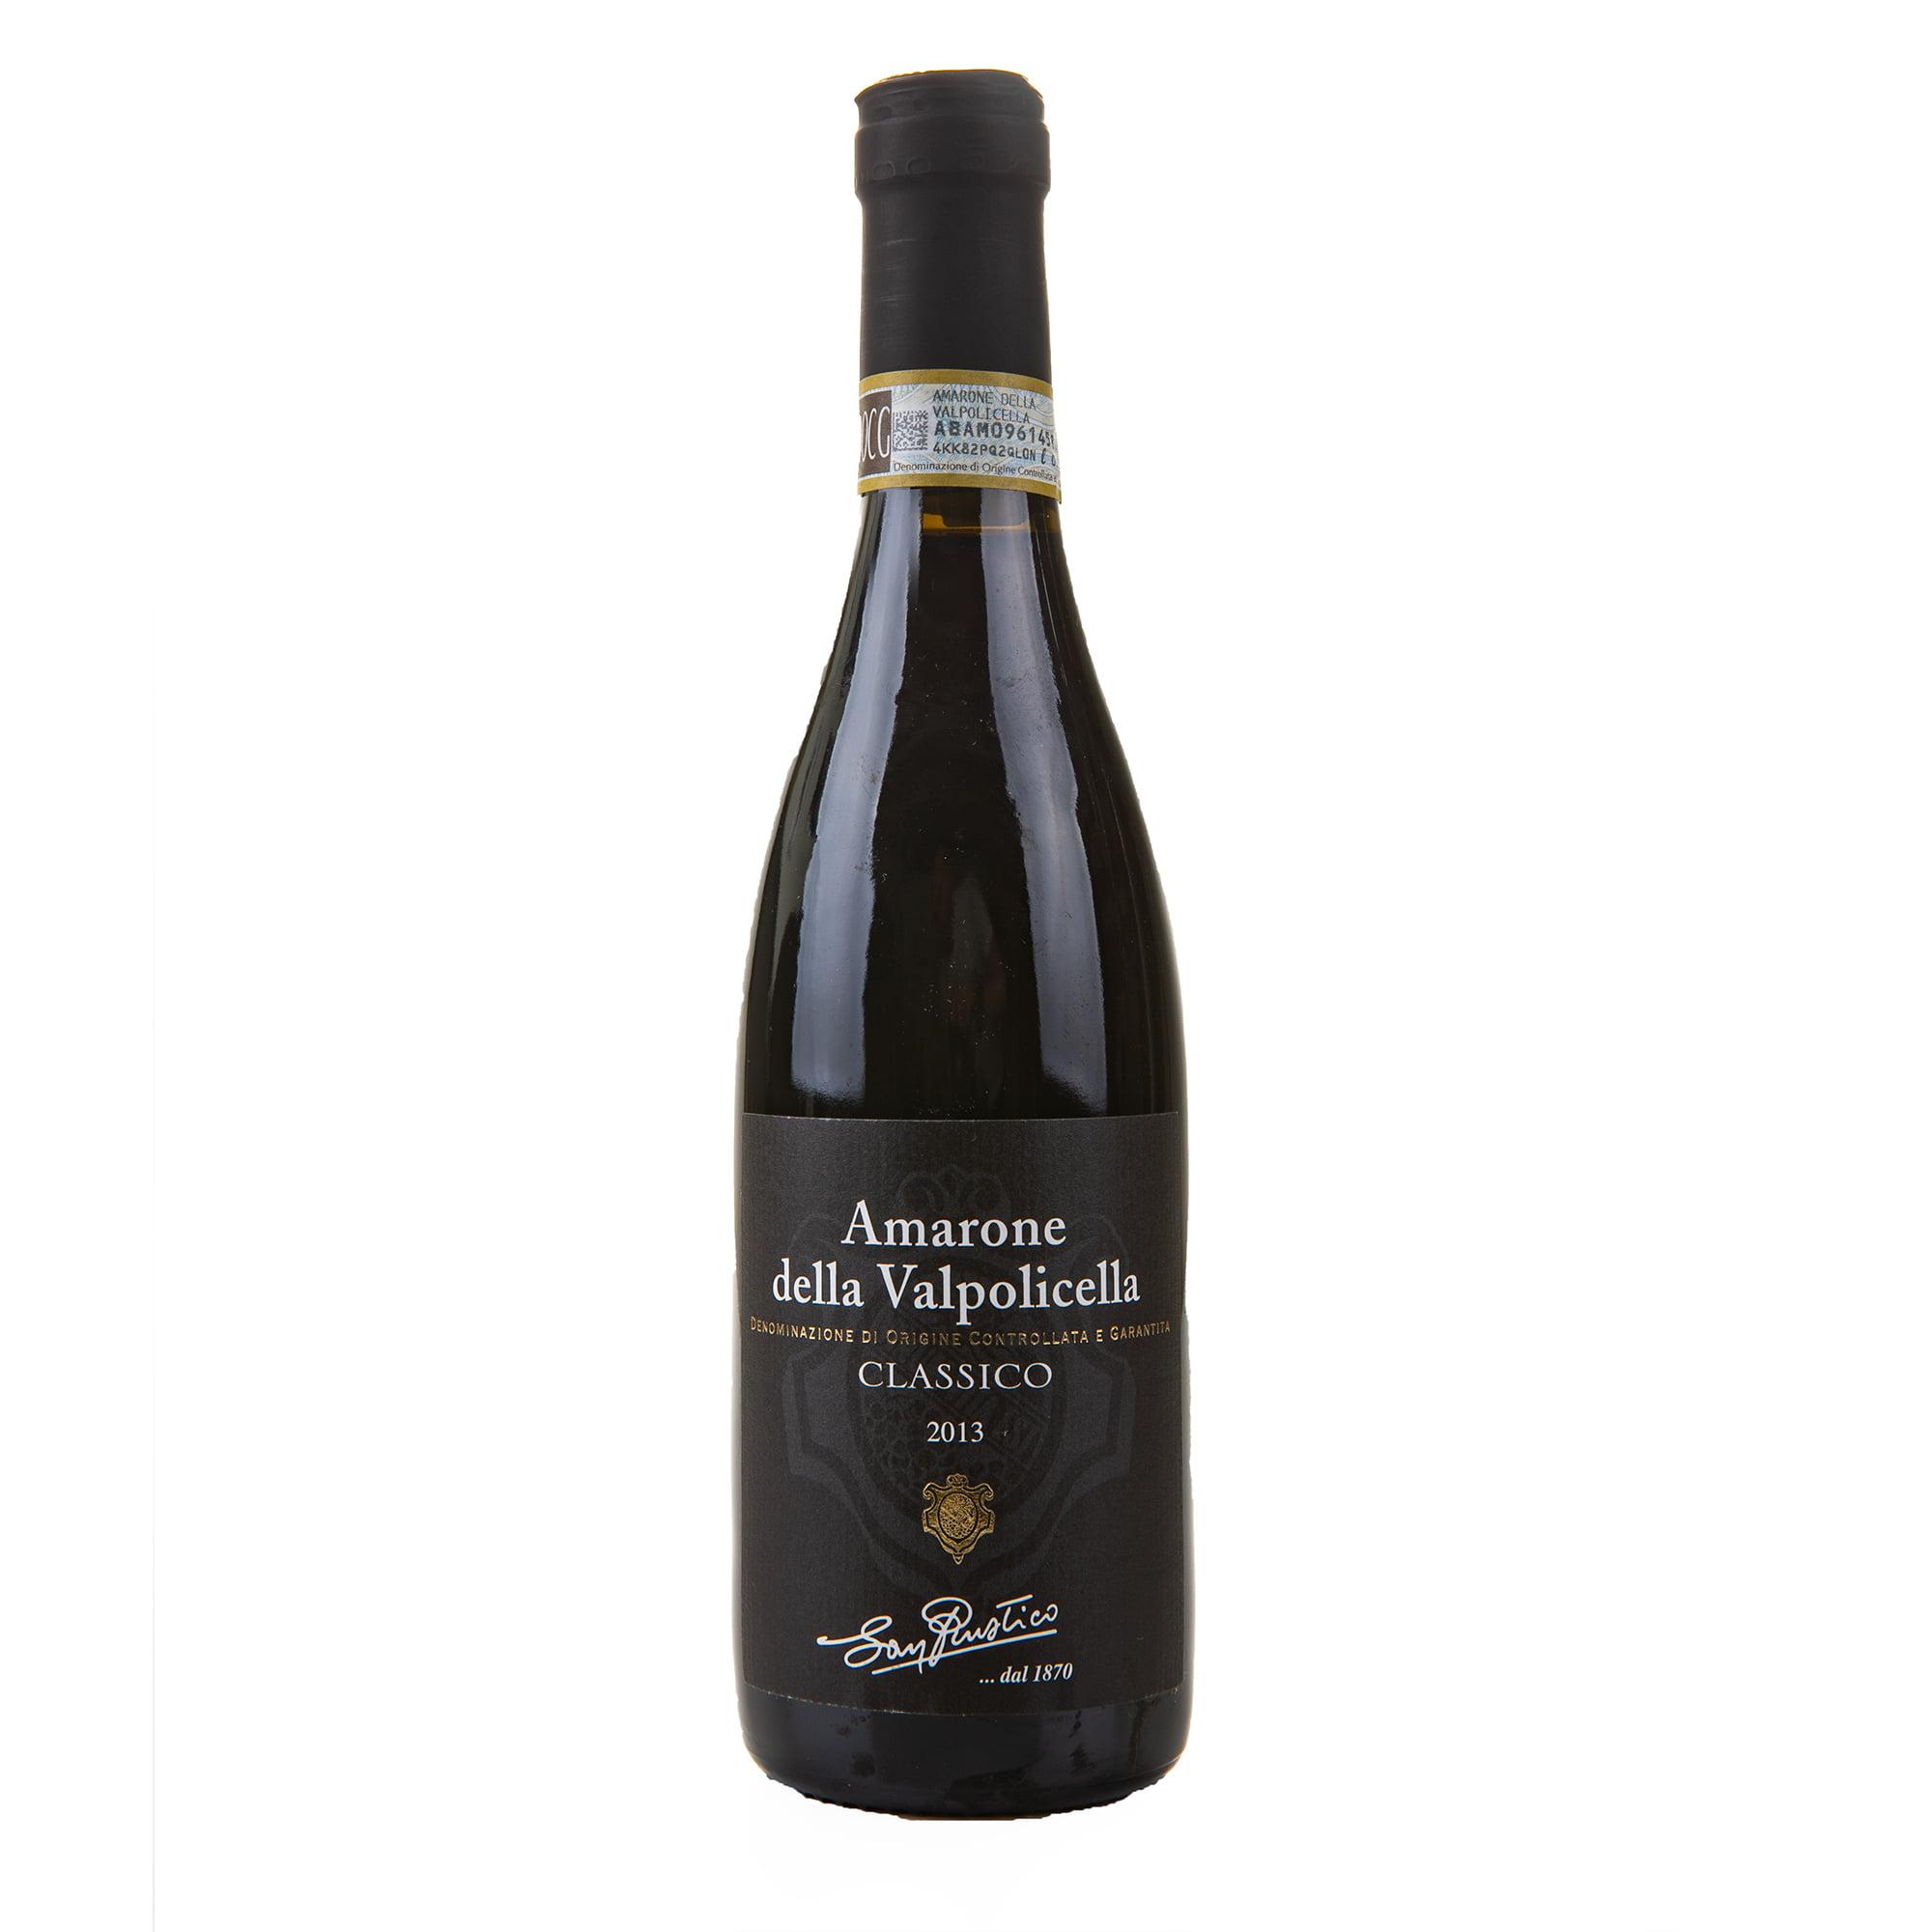 Amarone della Valpolicella San Rustico d.o.c.g. 2013